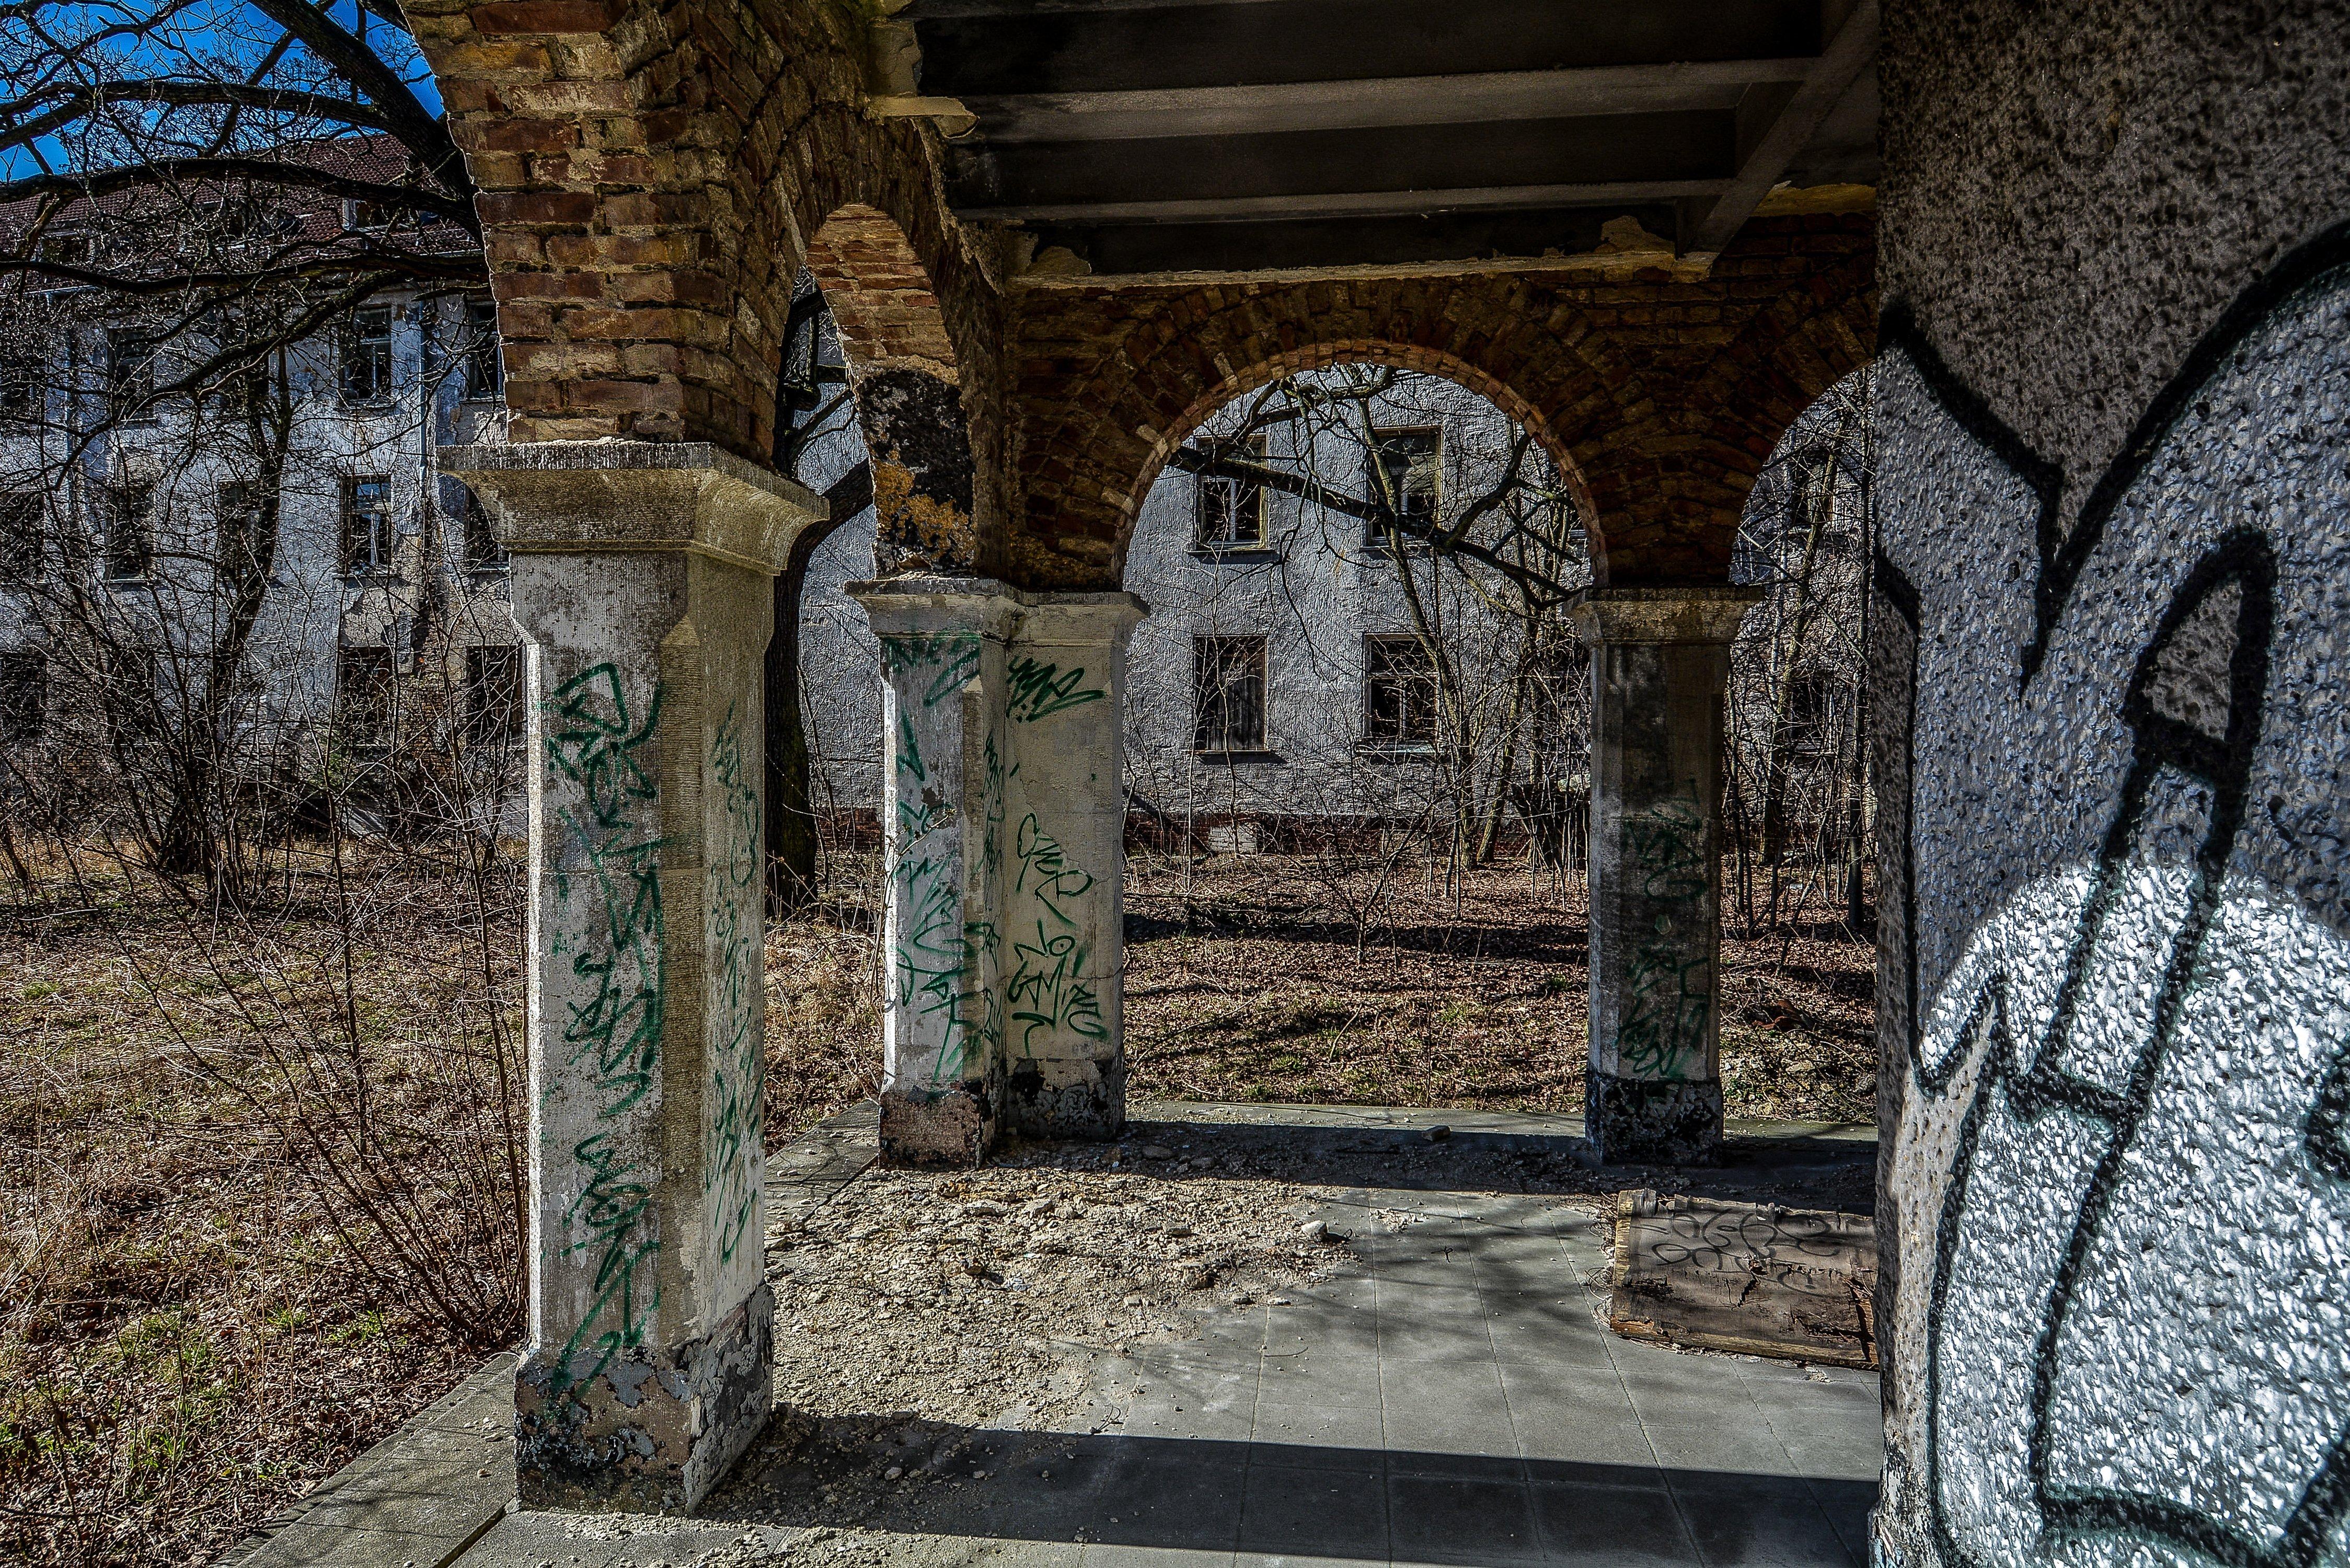 columns nazi soviet military base abandoned urbex urban exploring loewen adler kaserne elstal wustermark roter stern kaserne germany lost places